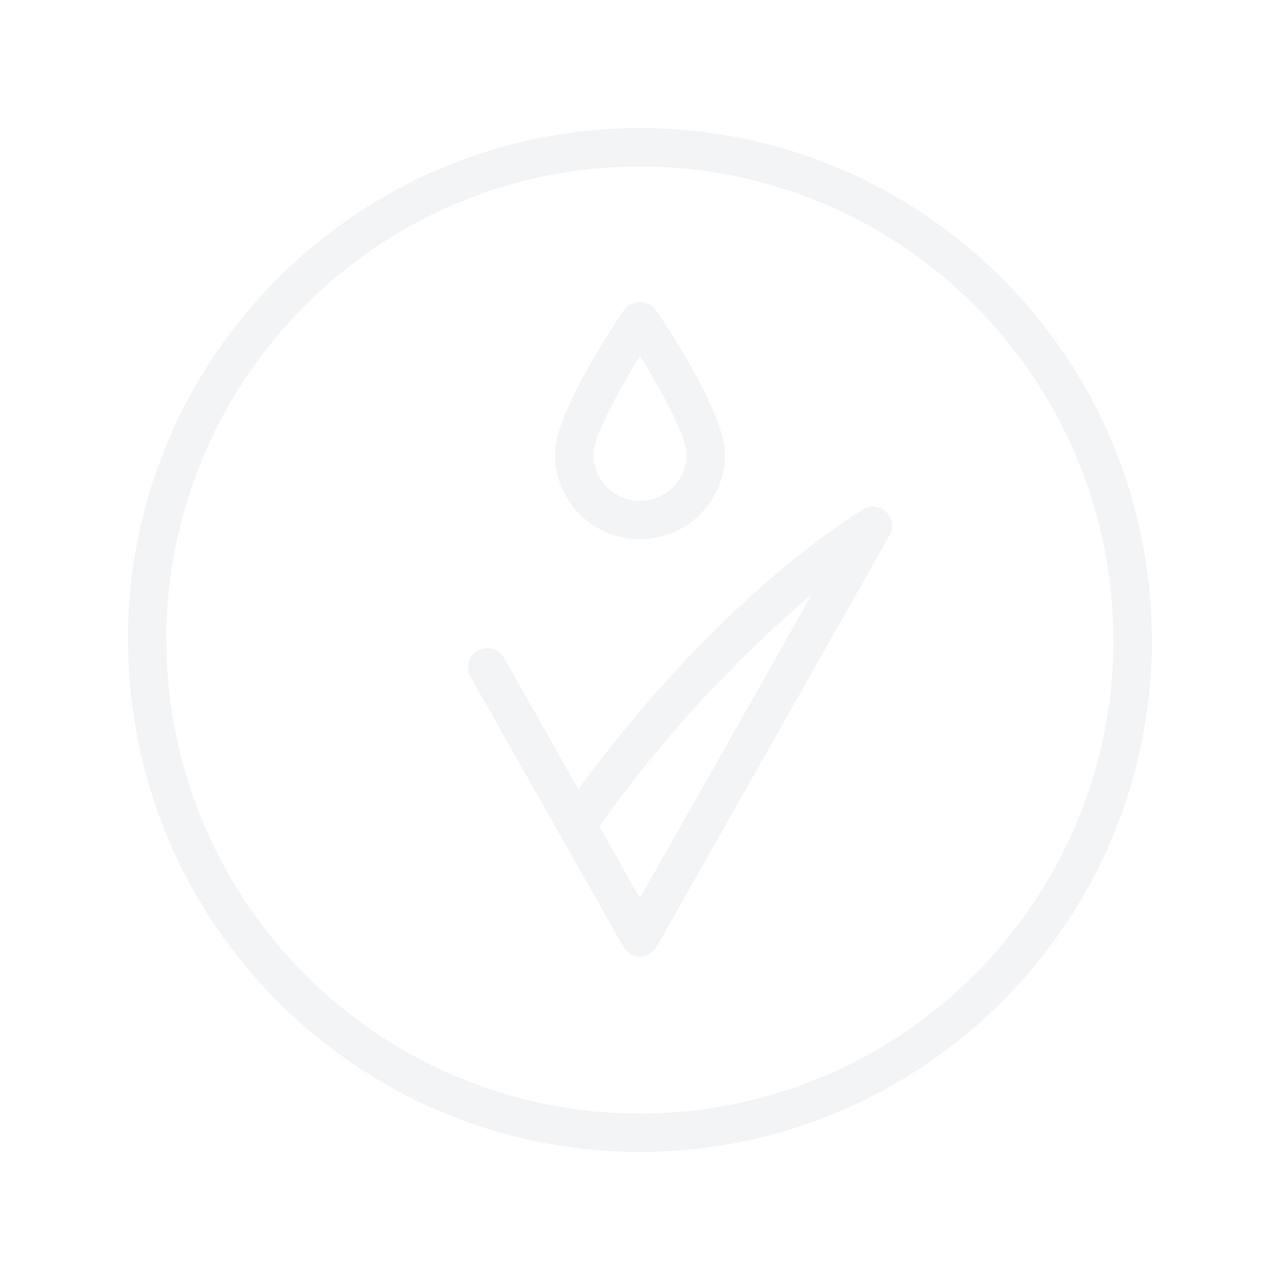 ELIZABETH ARDEN Green Tea Fig Honey Drops Body Cream 250ml